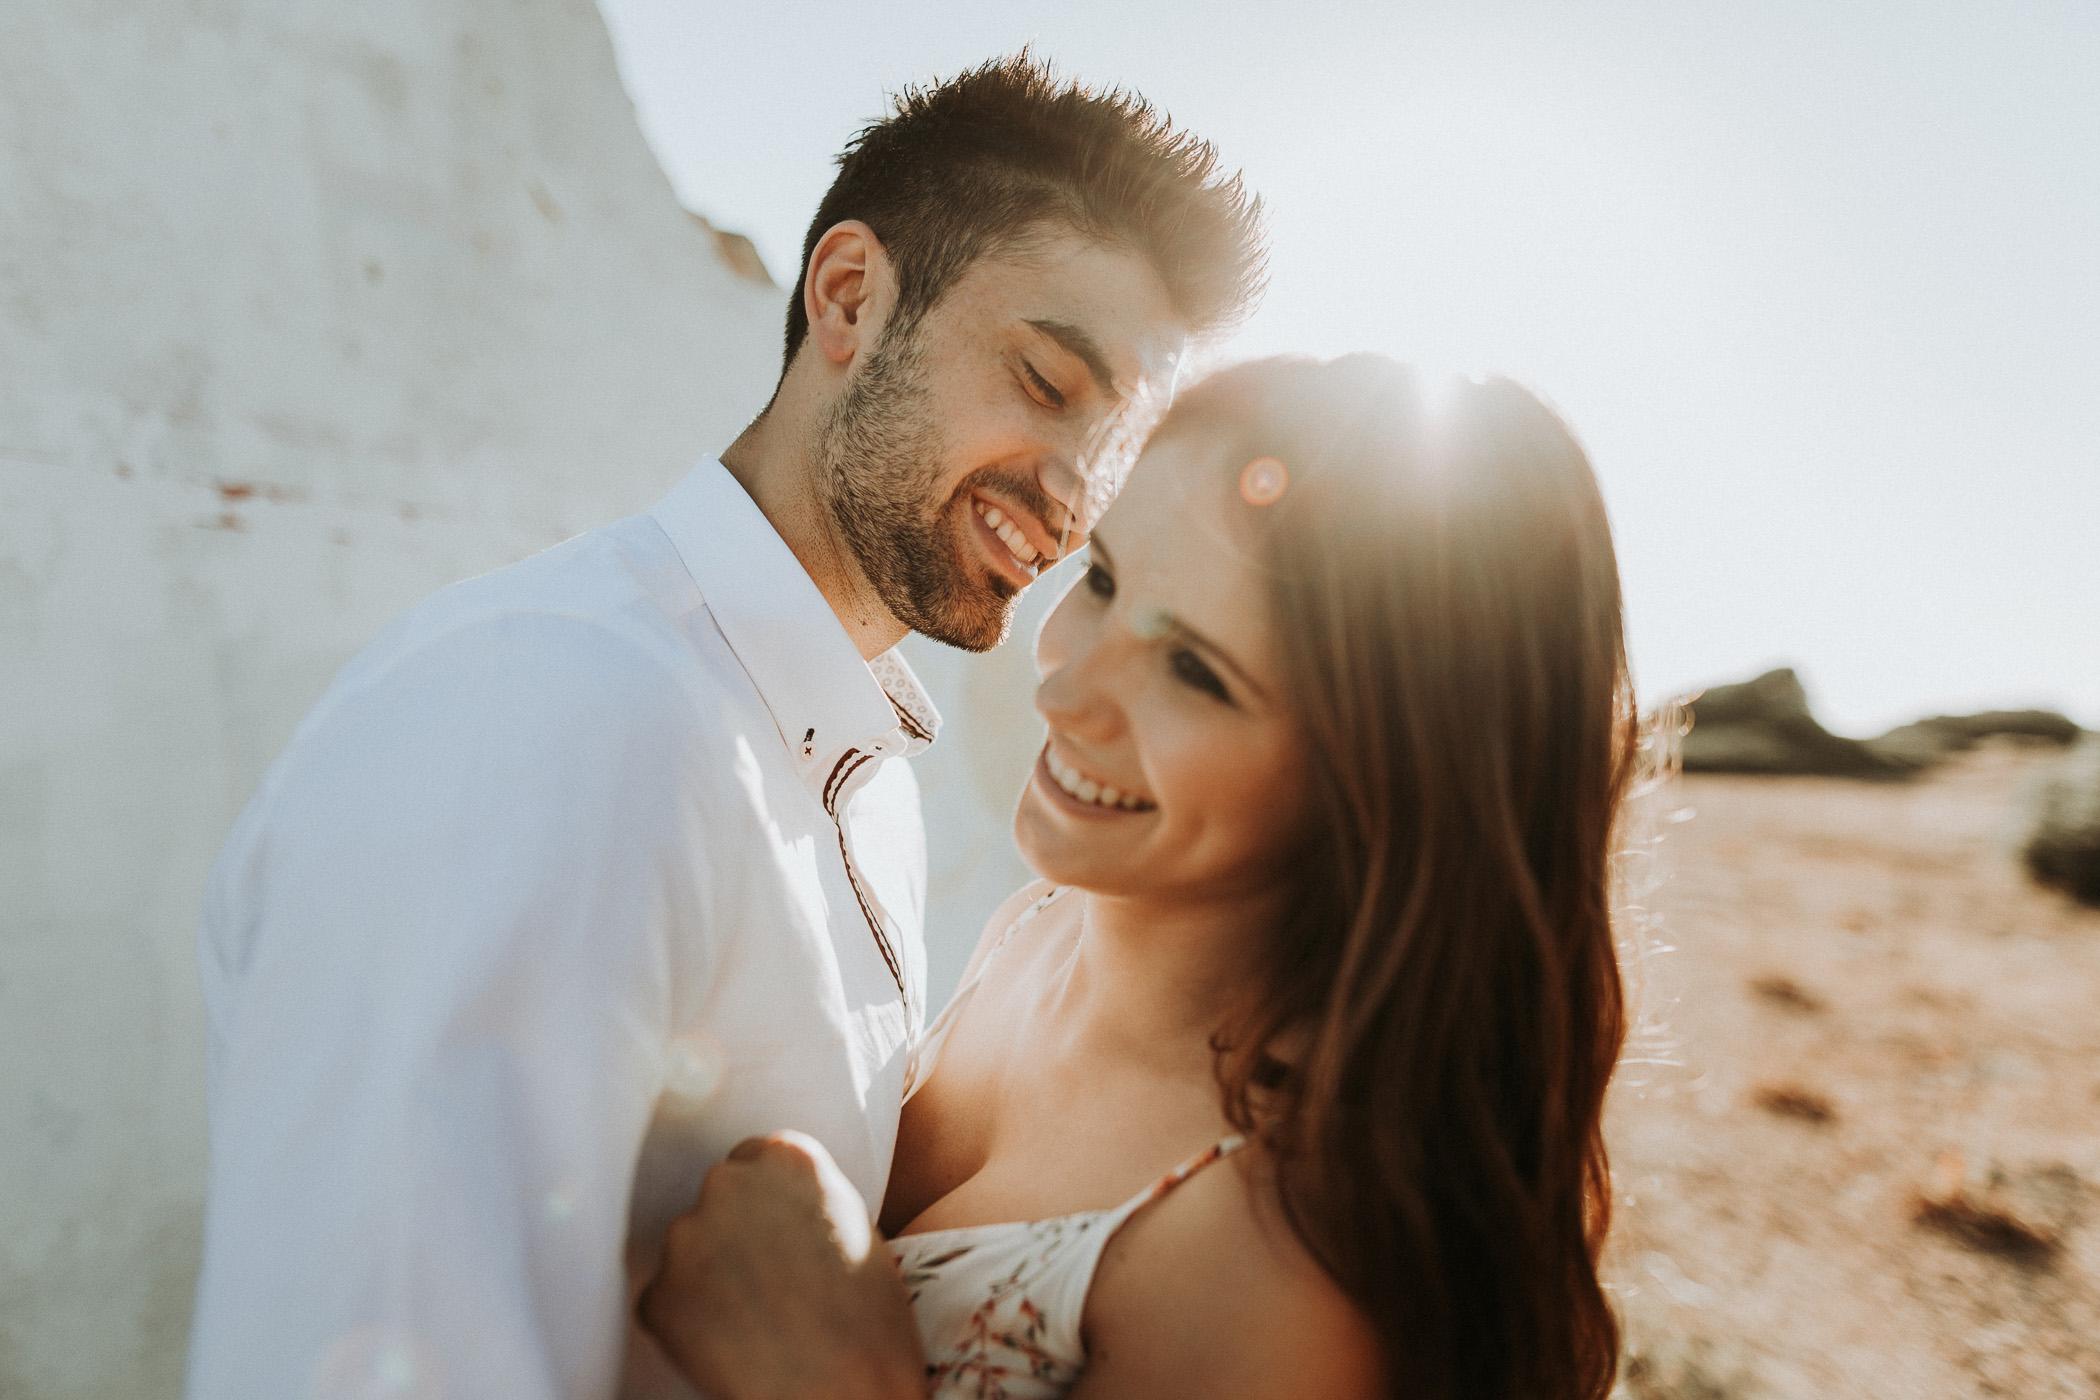 DanielaMarquardtPhotography_wedding_elopement_mallorca_spain_calapi_palma_lauraandtoni_370